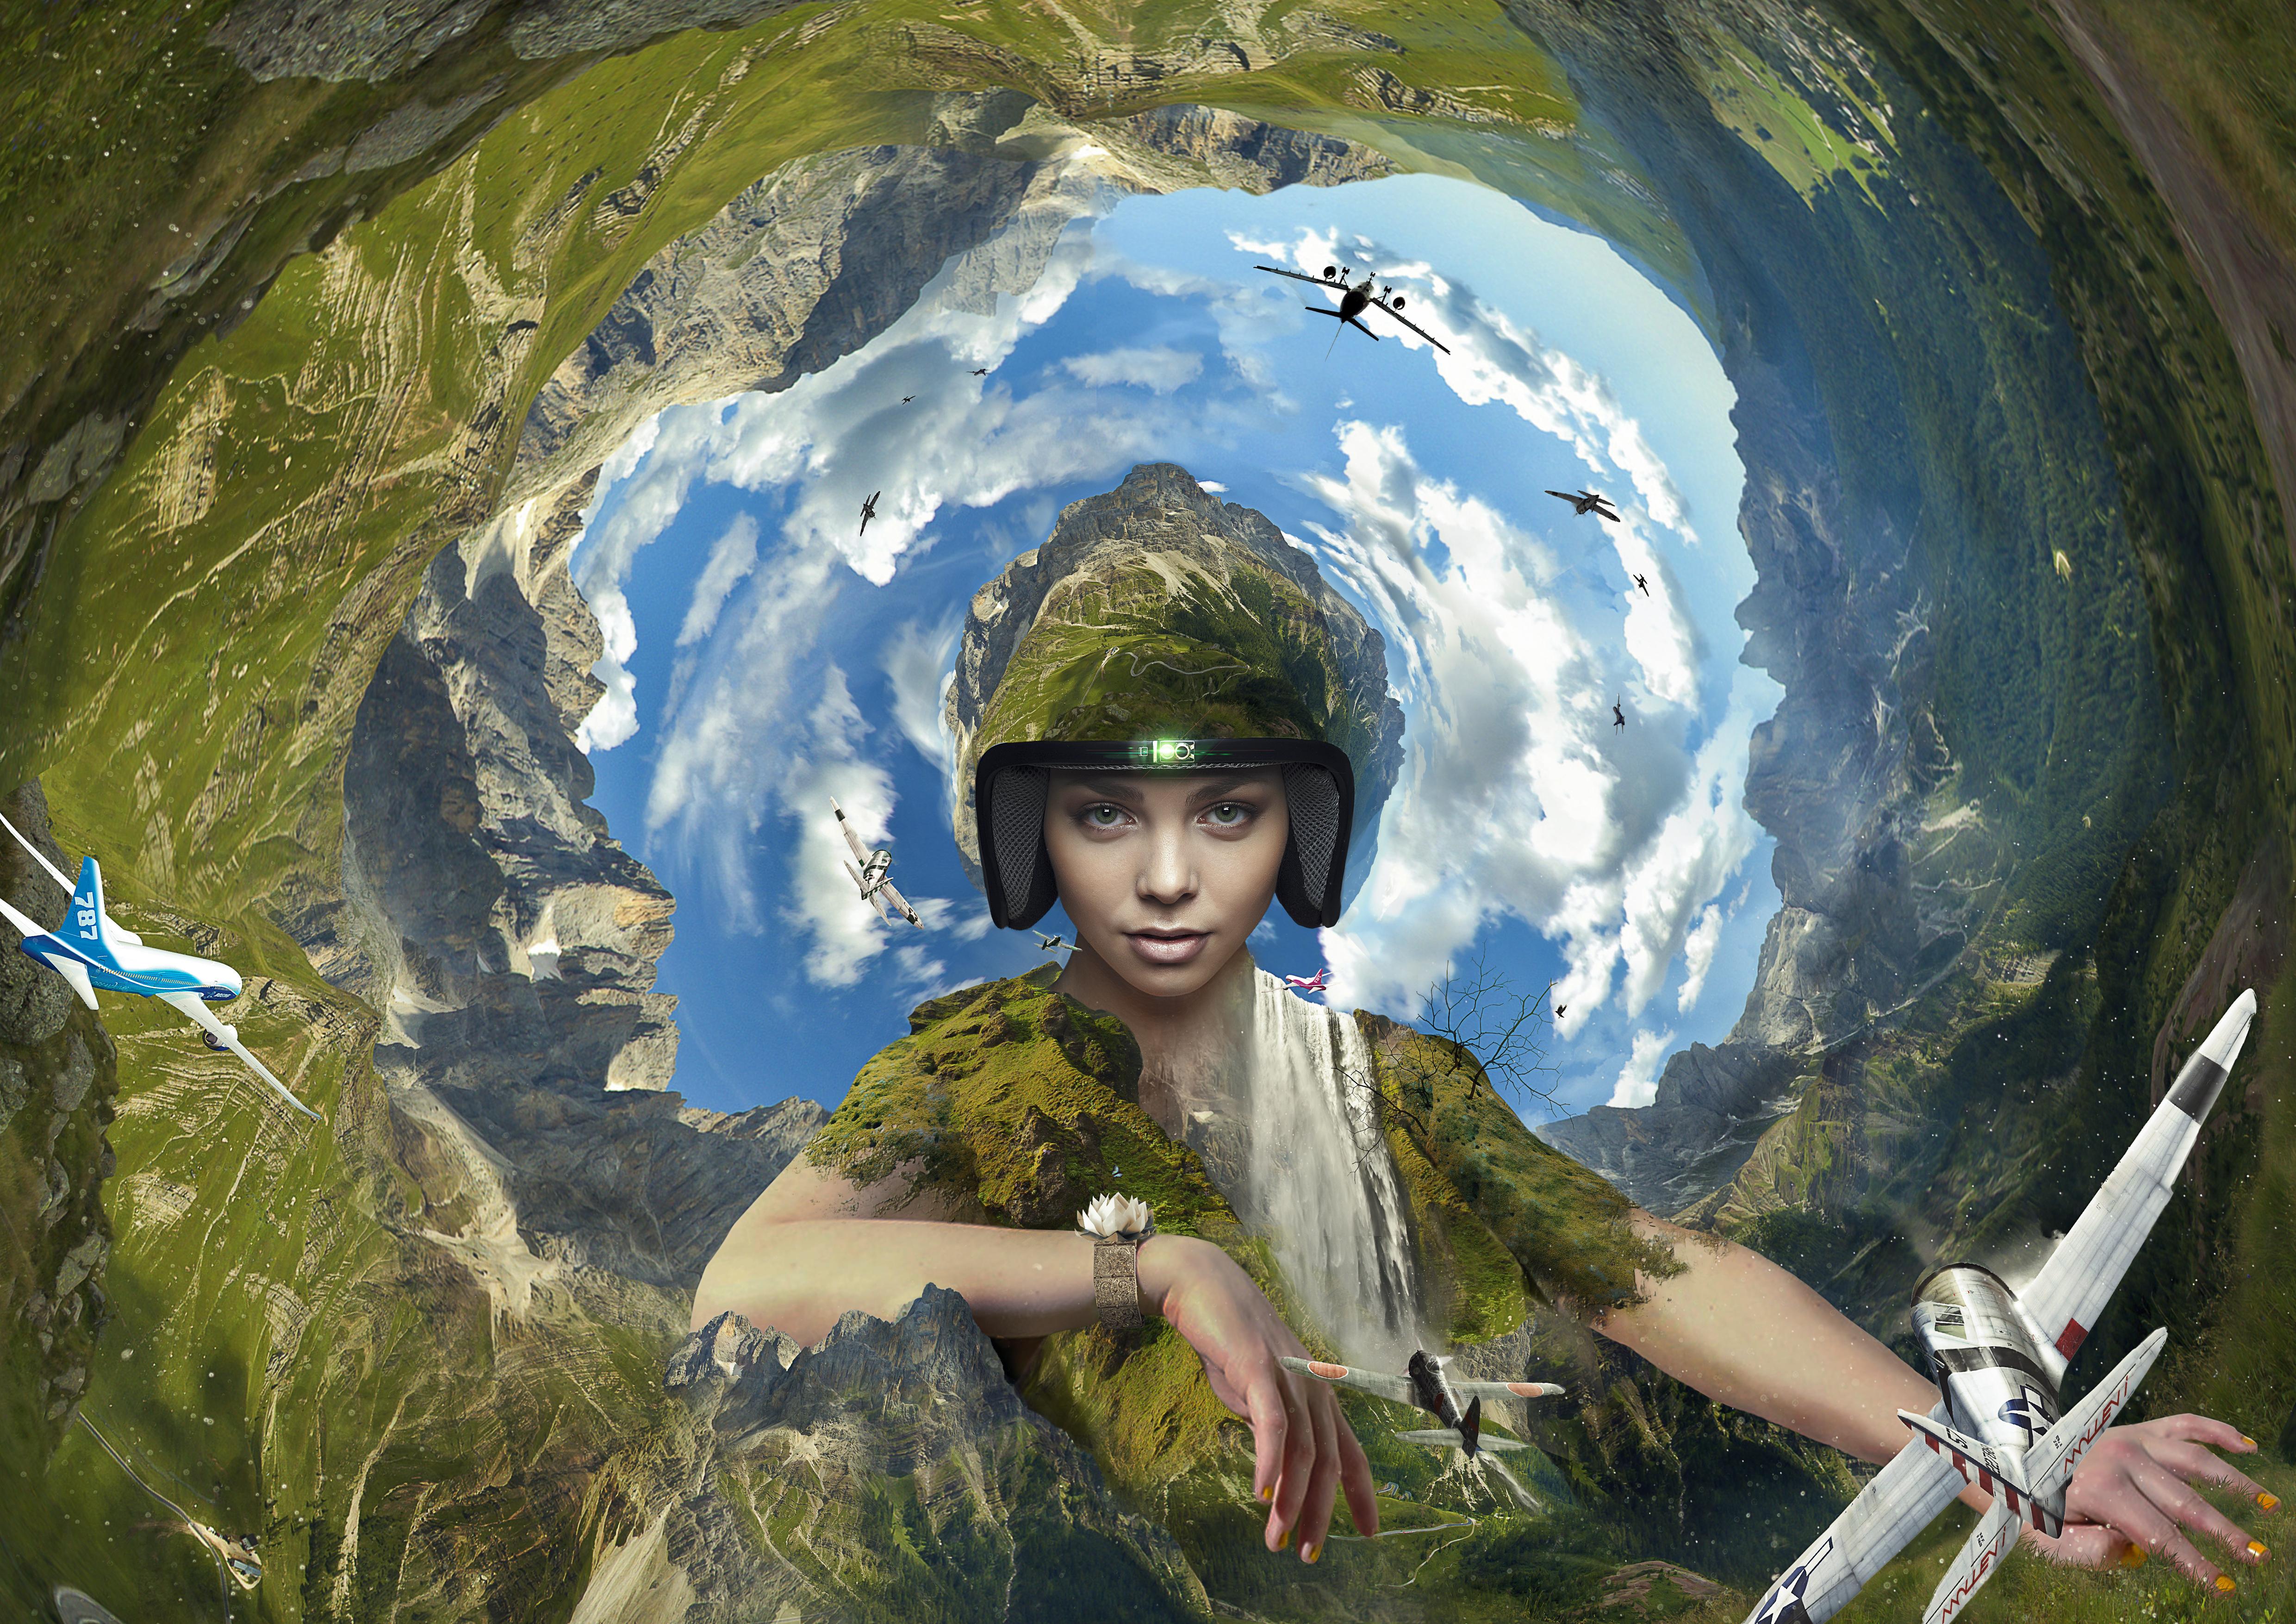 Aeronaut's Den Fotolia Madre naturaleza mother nature, earth tierra, molleví, cascada, agua waterfall, plane avión, piloto, sexy mujer chica girl